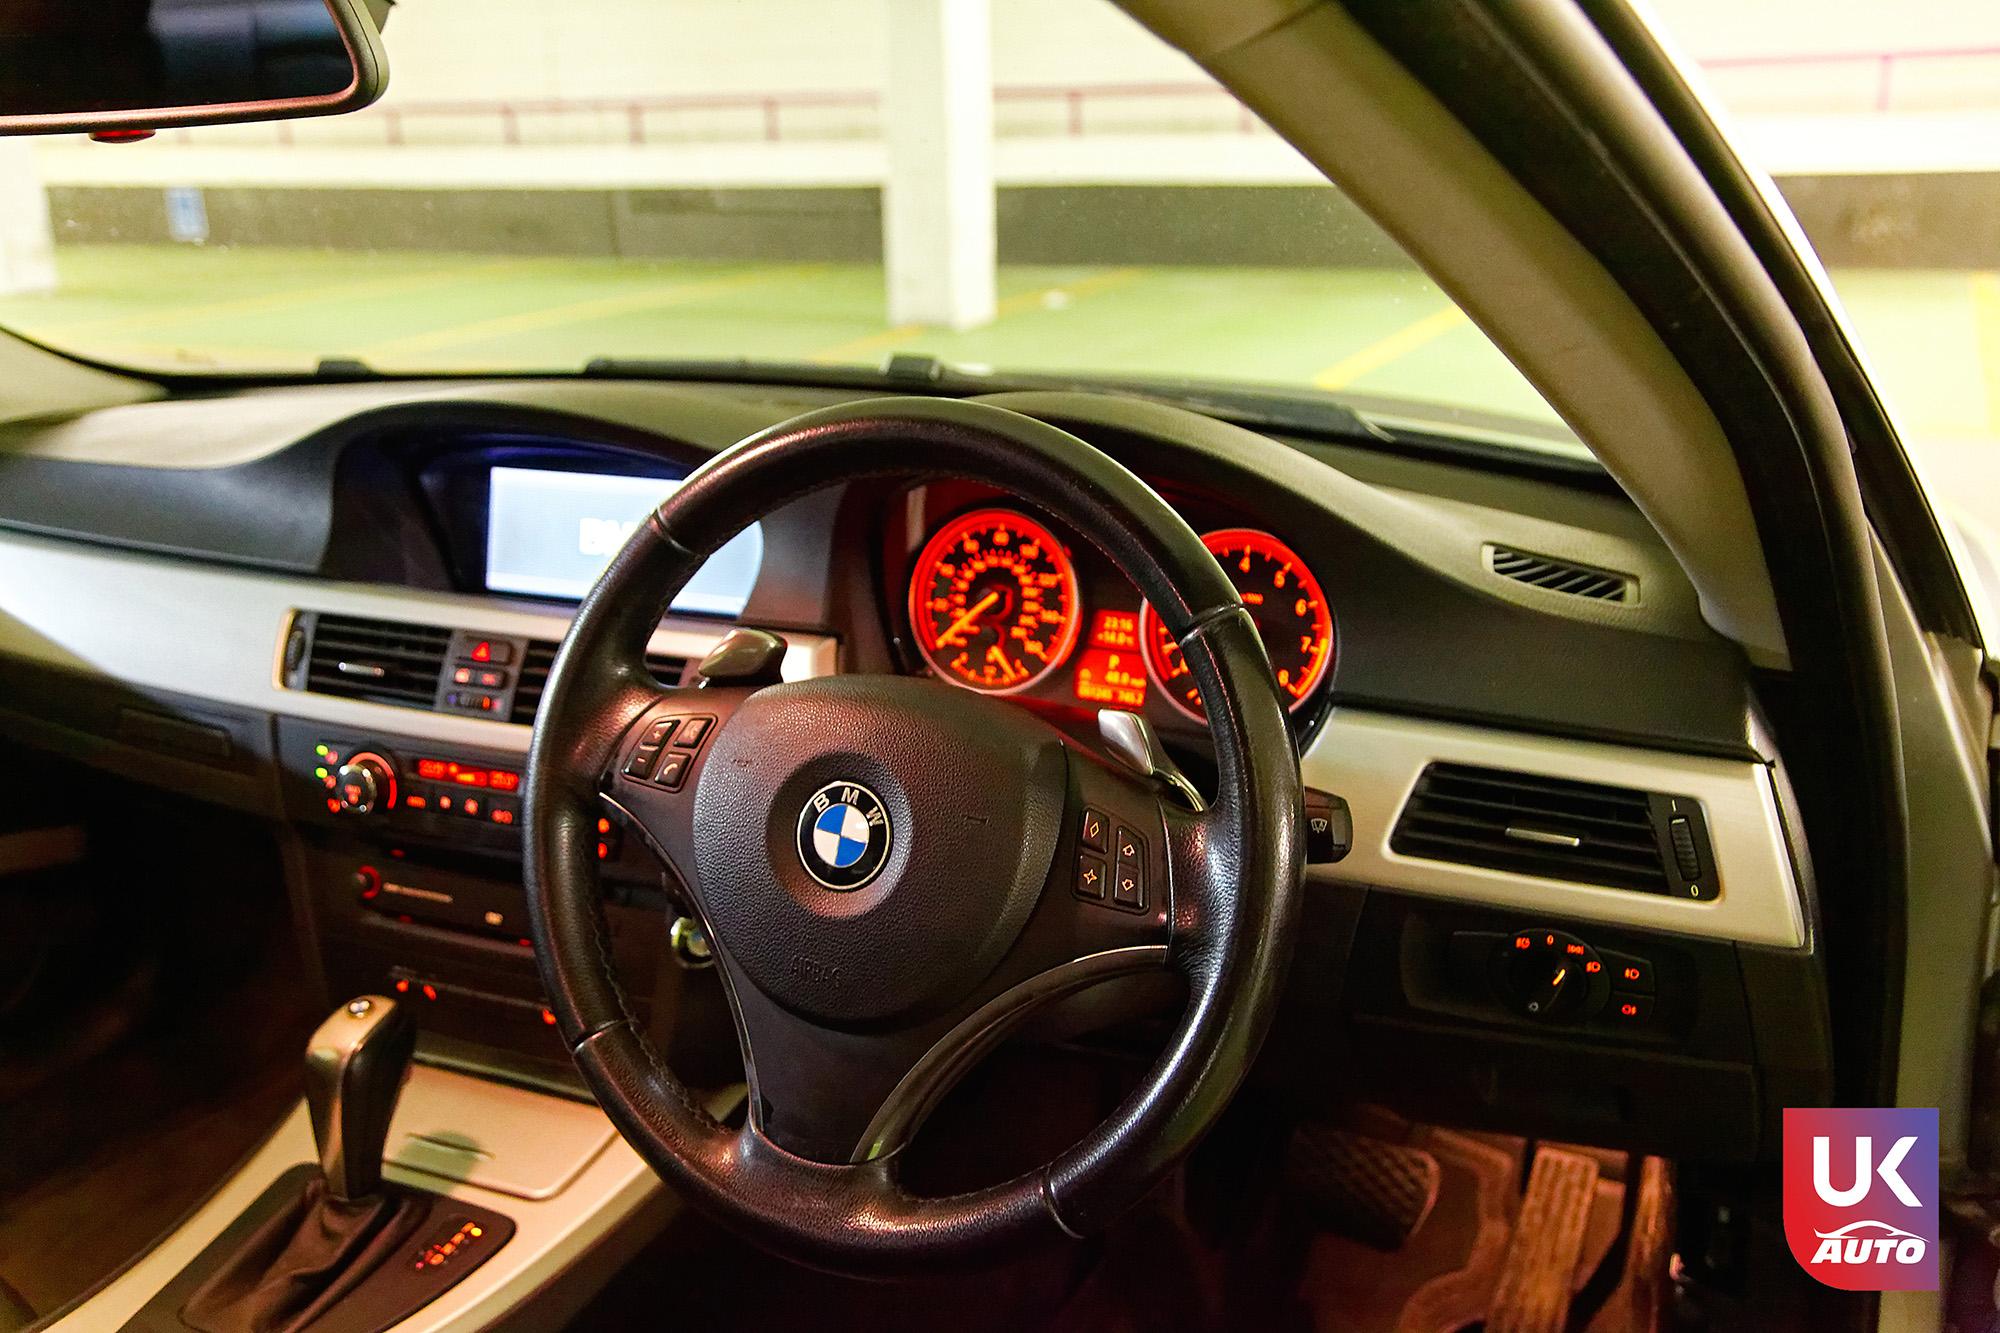 Bmw 335i rhd import uk bmw occasion bmw mandataire e92 rhd coupe uk auto uk ukauto5 - Felecitation a Julien pour cette BMW 335i E92 COUPE RHD importateur voitures anglaises